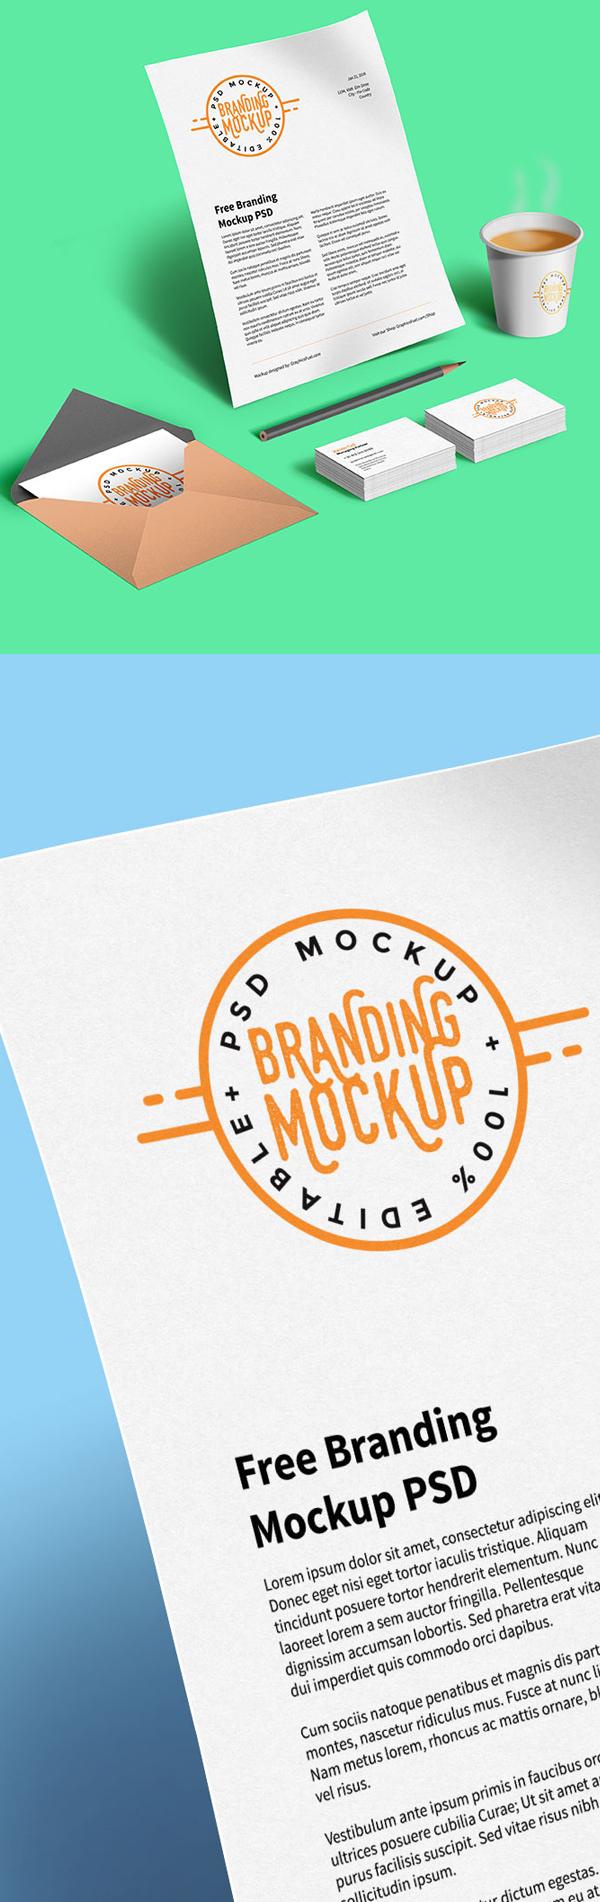 Diseño PSD de maqueta de marca gratis